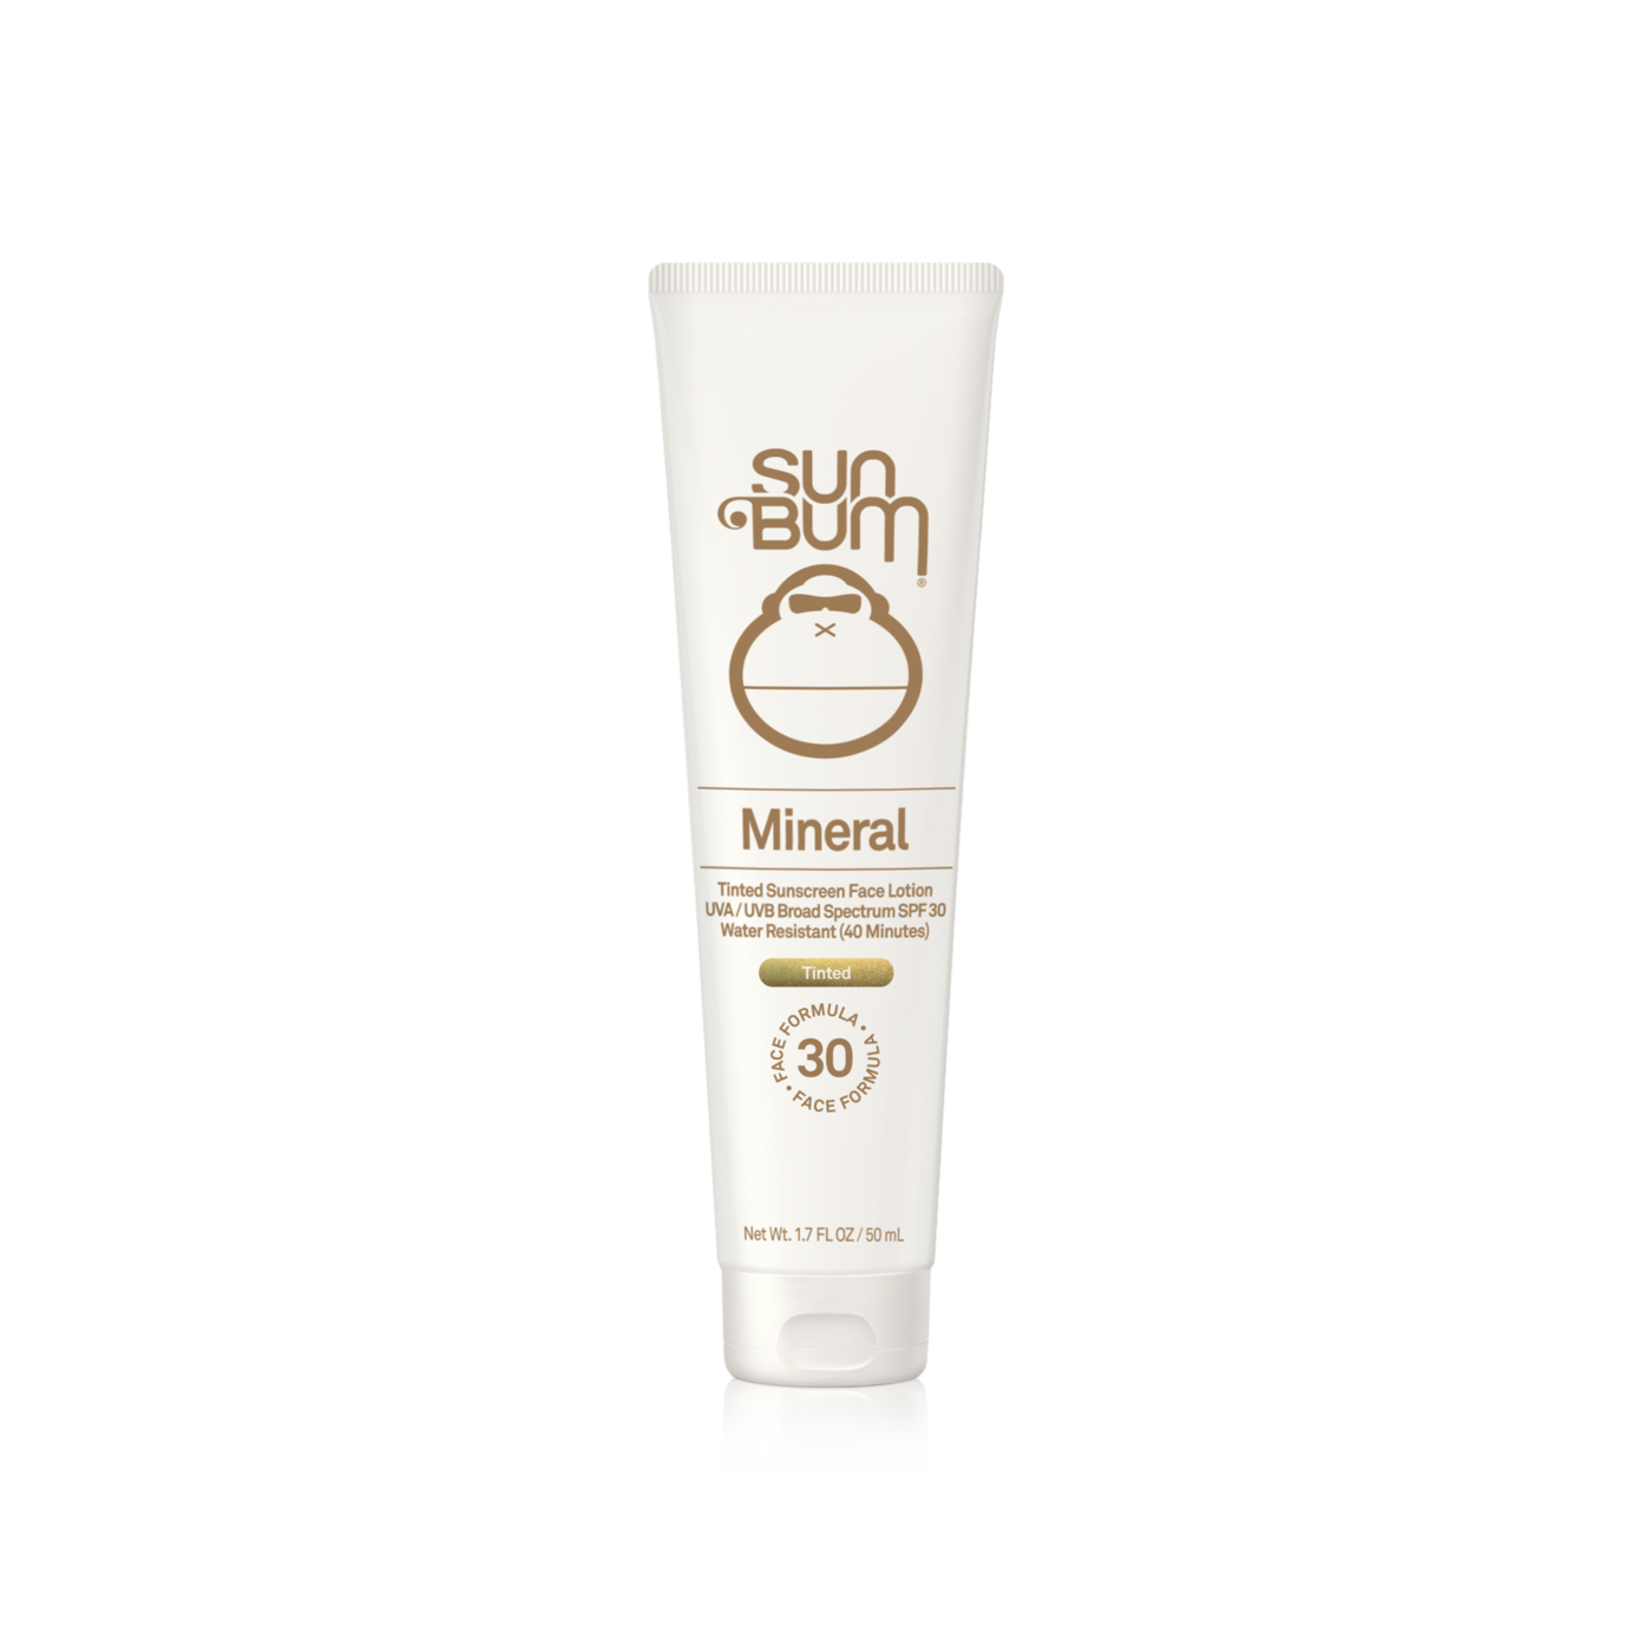 Sun Bum MINERAL SPF 30 FACE TINT 1.7 OZ